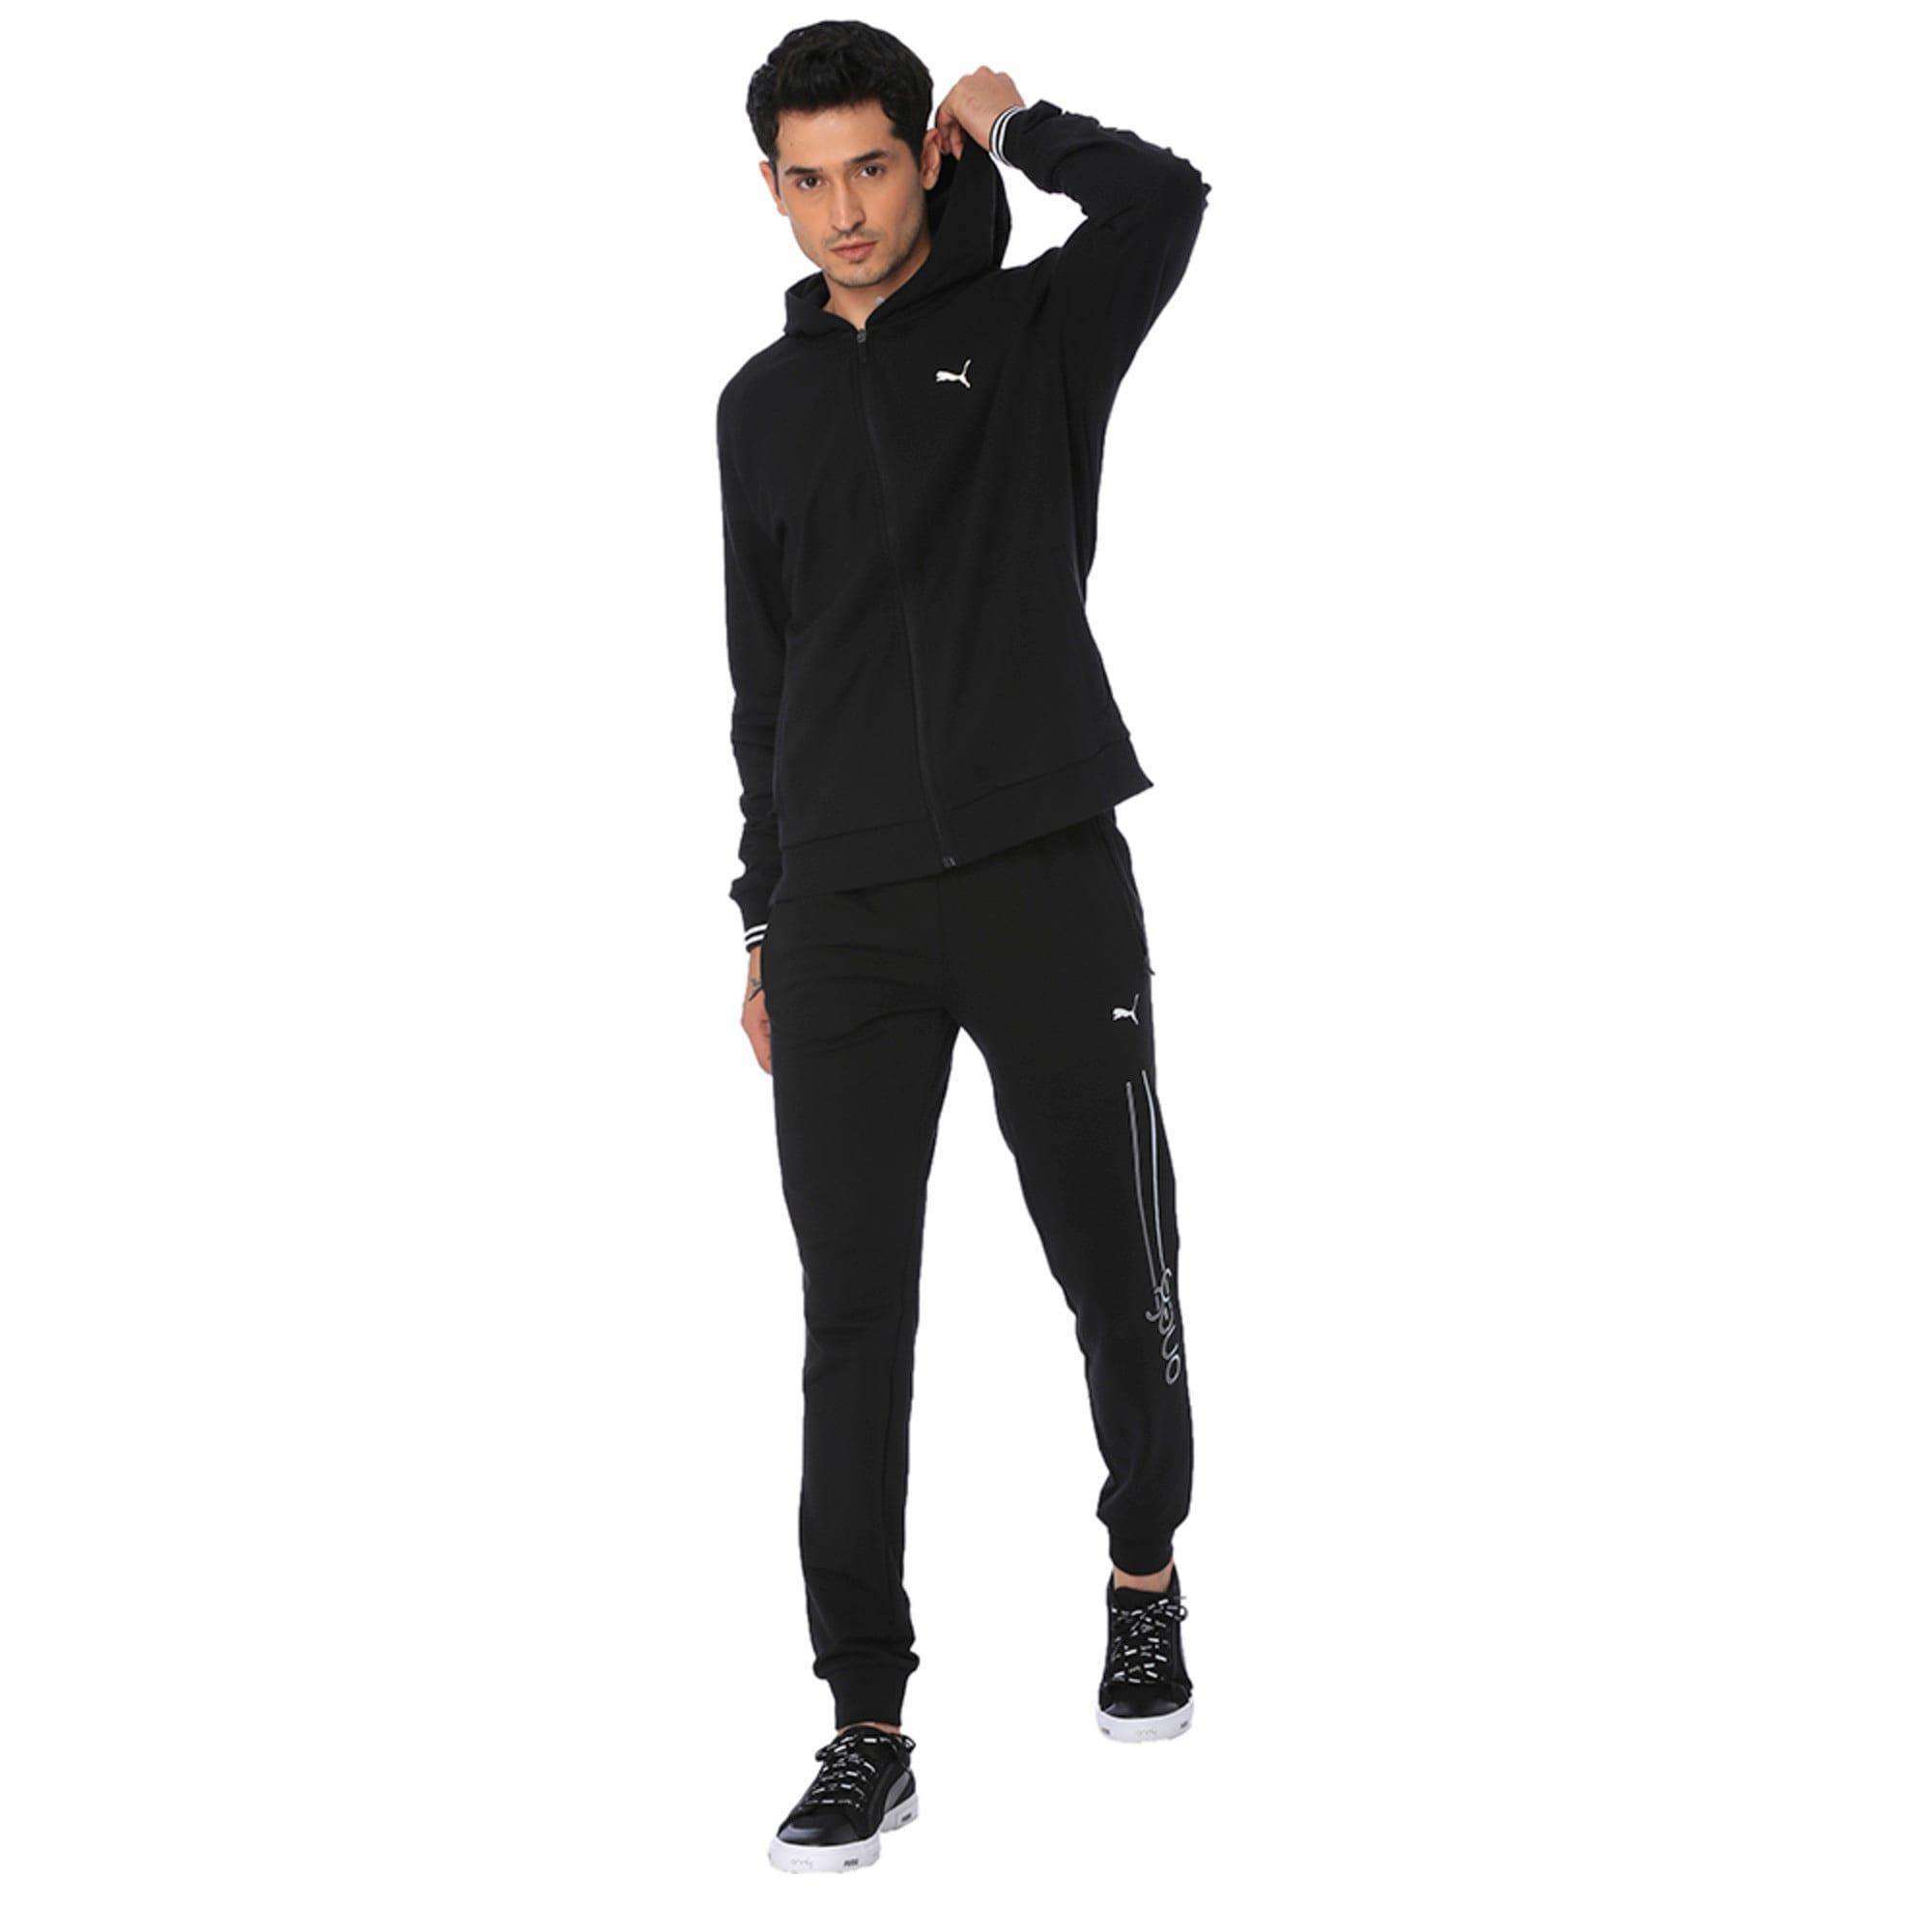 Thumbnail 1 of one8 Men's Hooded Track Jacket, Puma Black, medium-IND